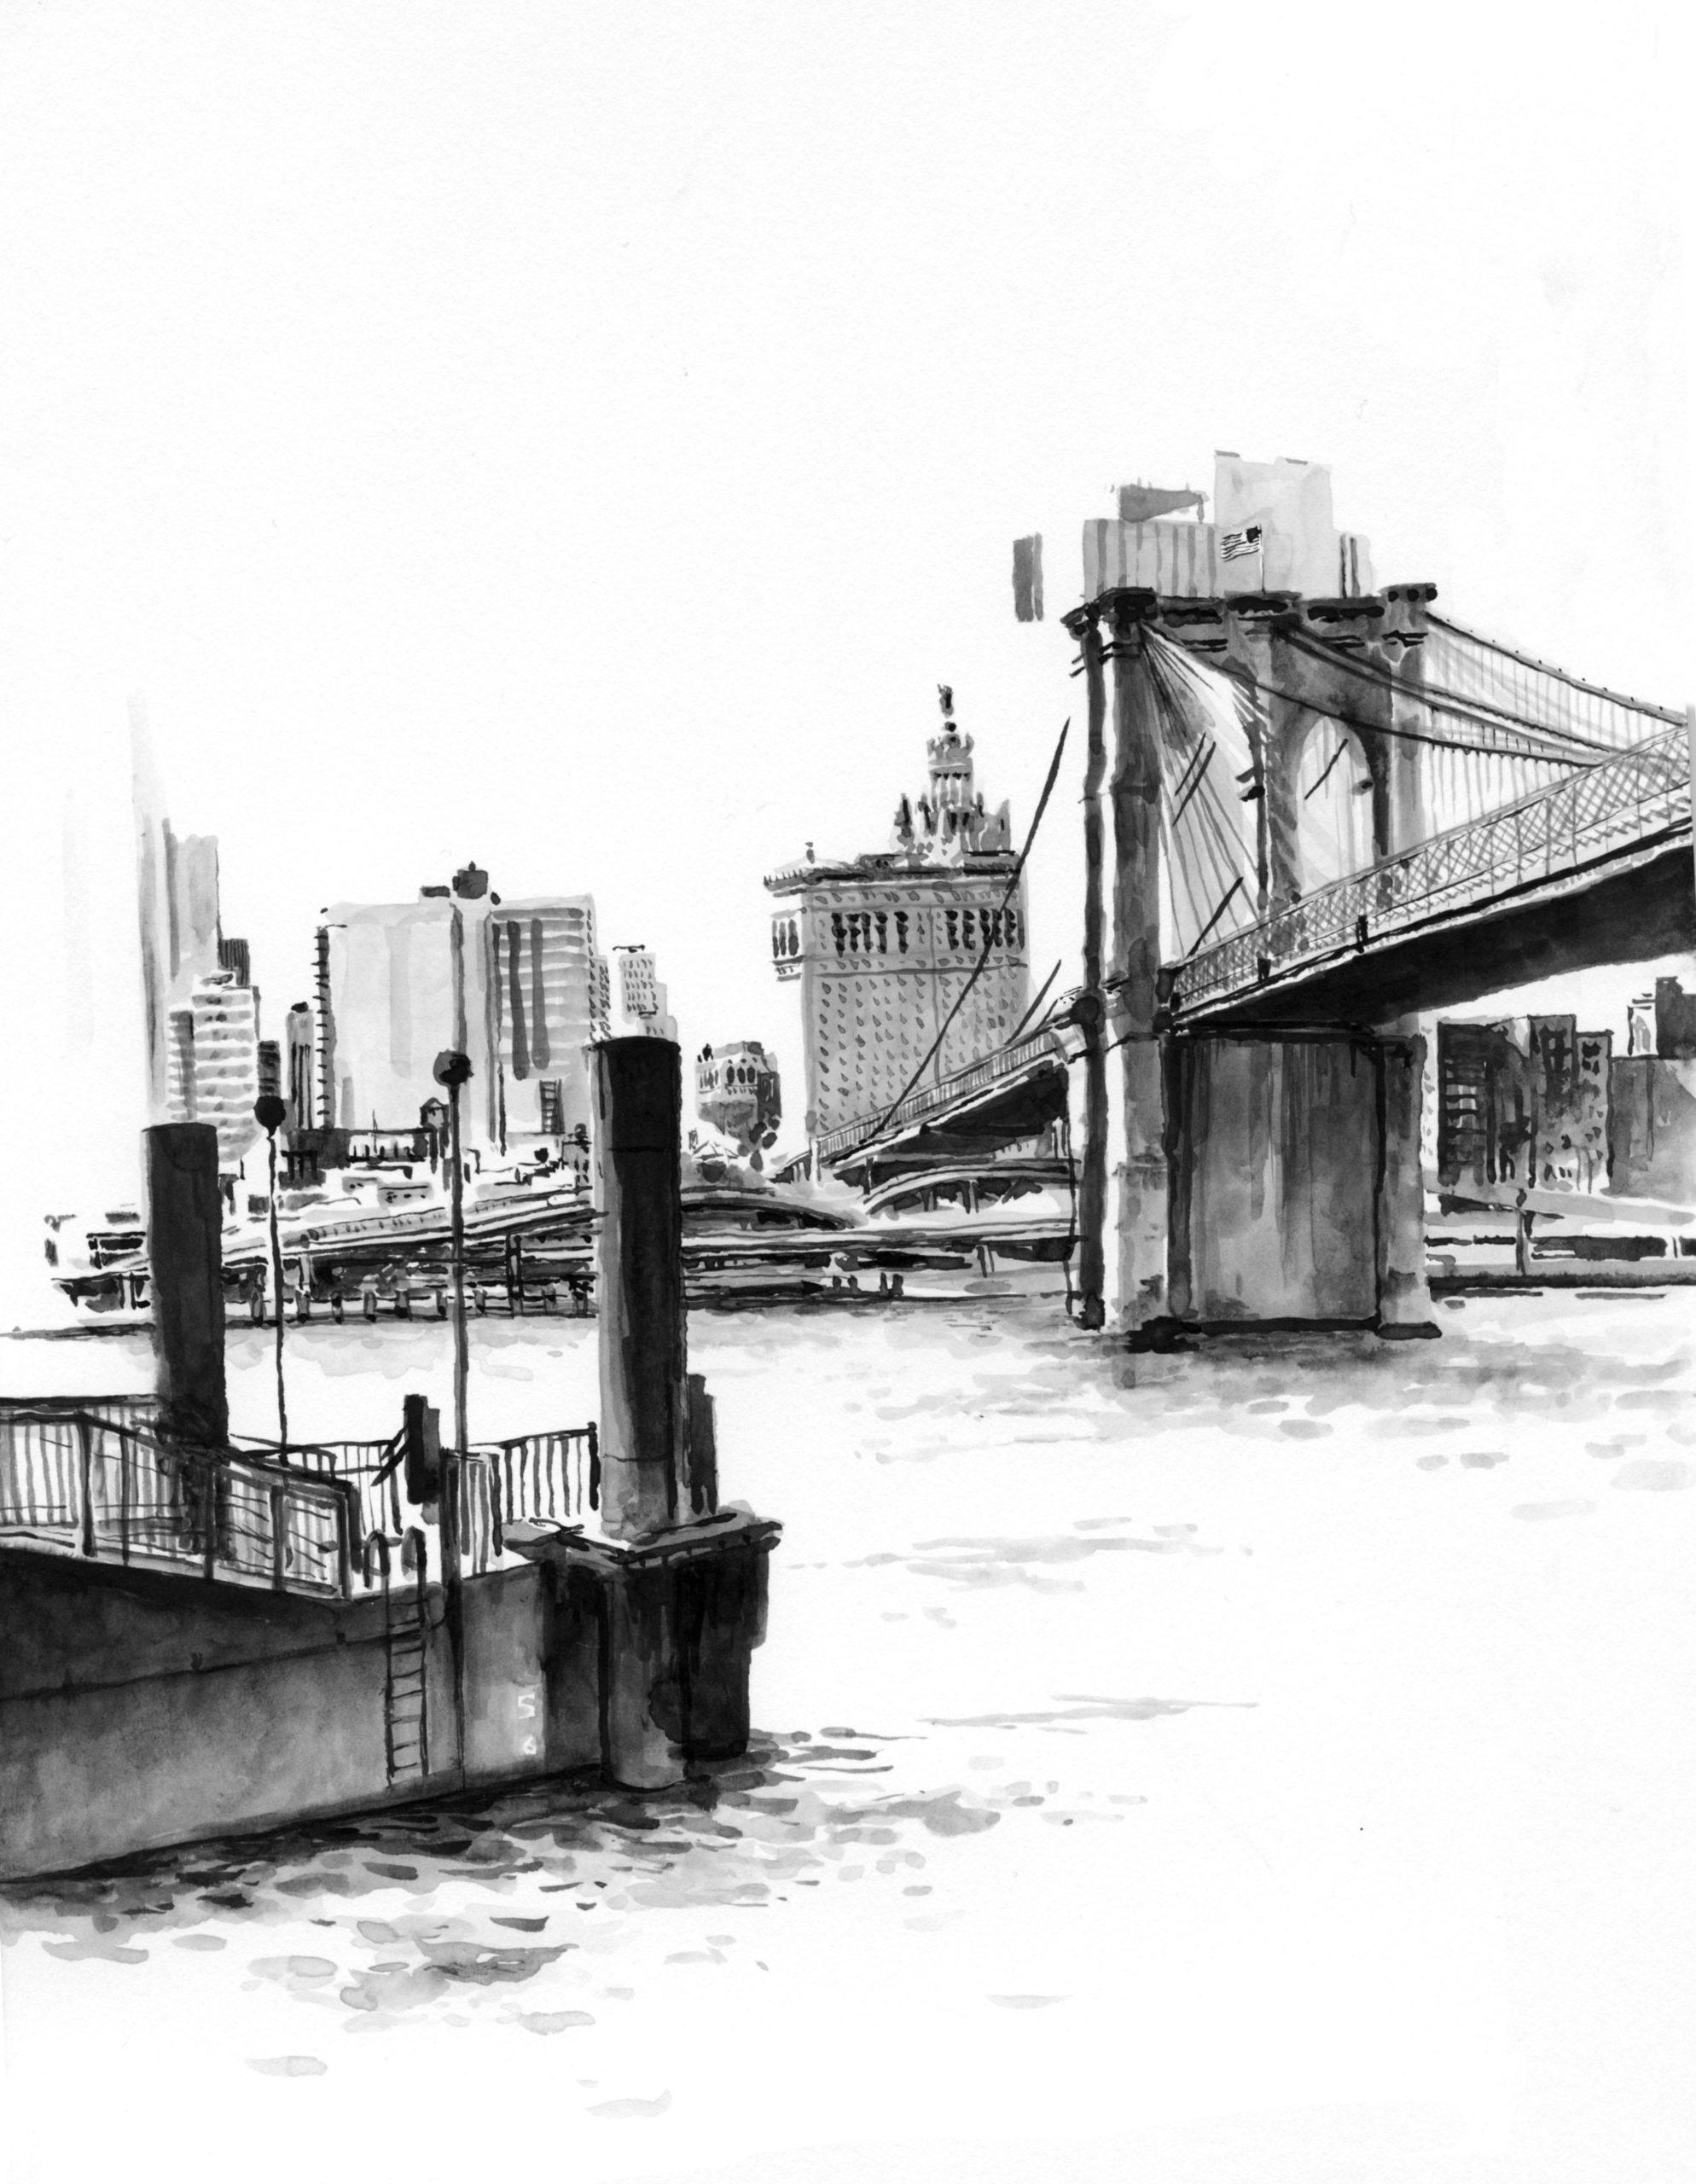 Carnettiste -Marielle Durand - NYC - Bouts du monde